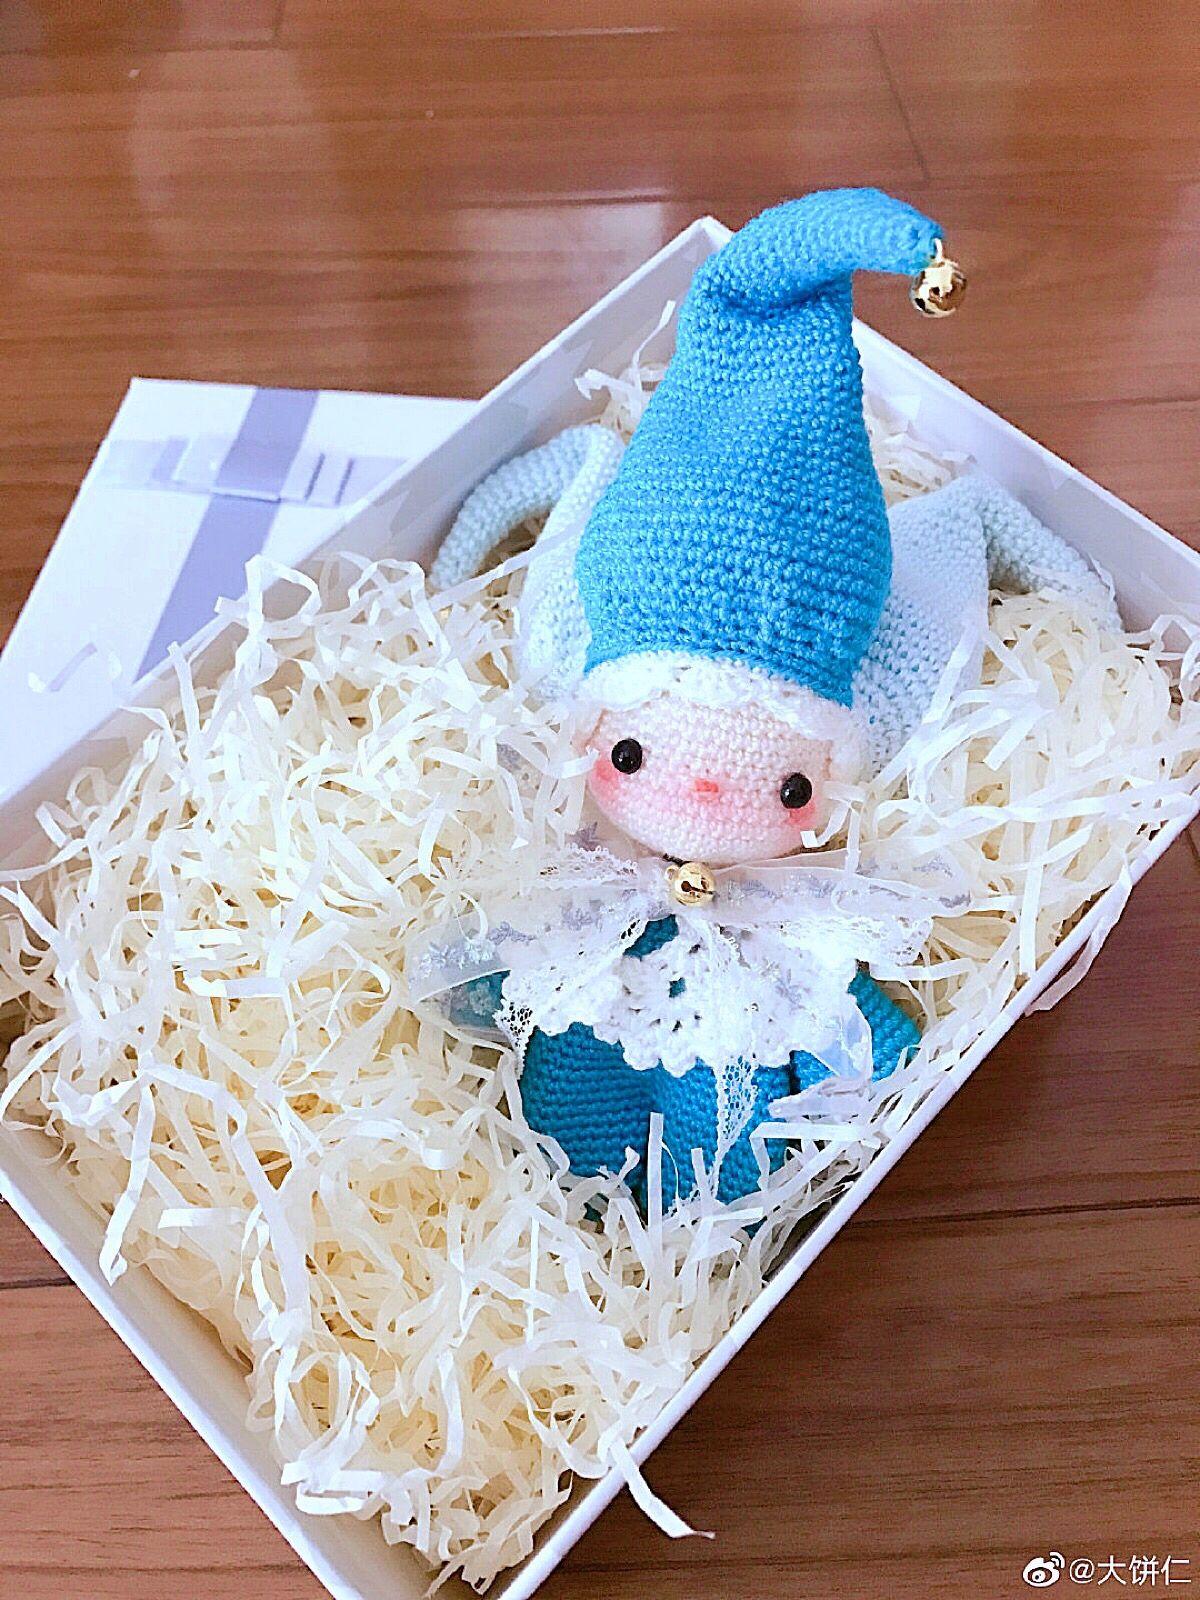 Pin by Apple yang on Weibo微博 | Amigurumi doll, Crochet, Crochet hats | 1600x1200